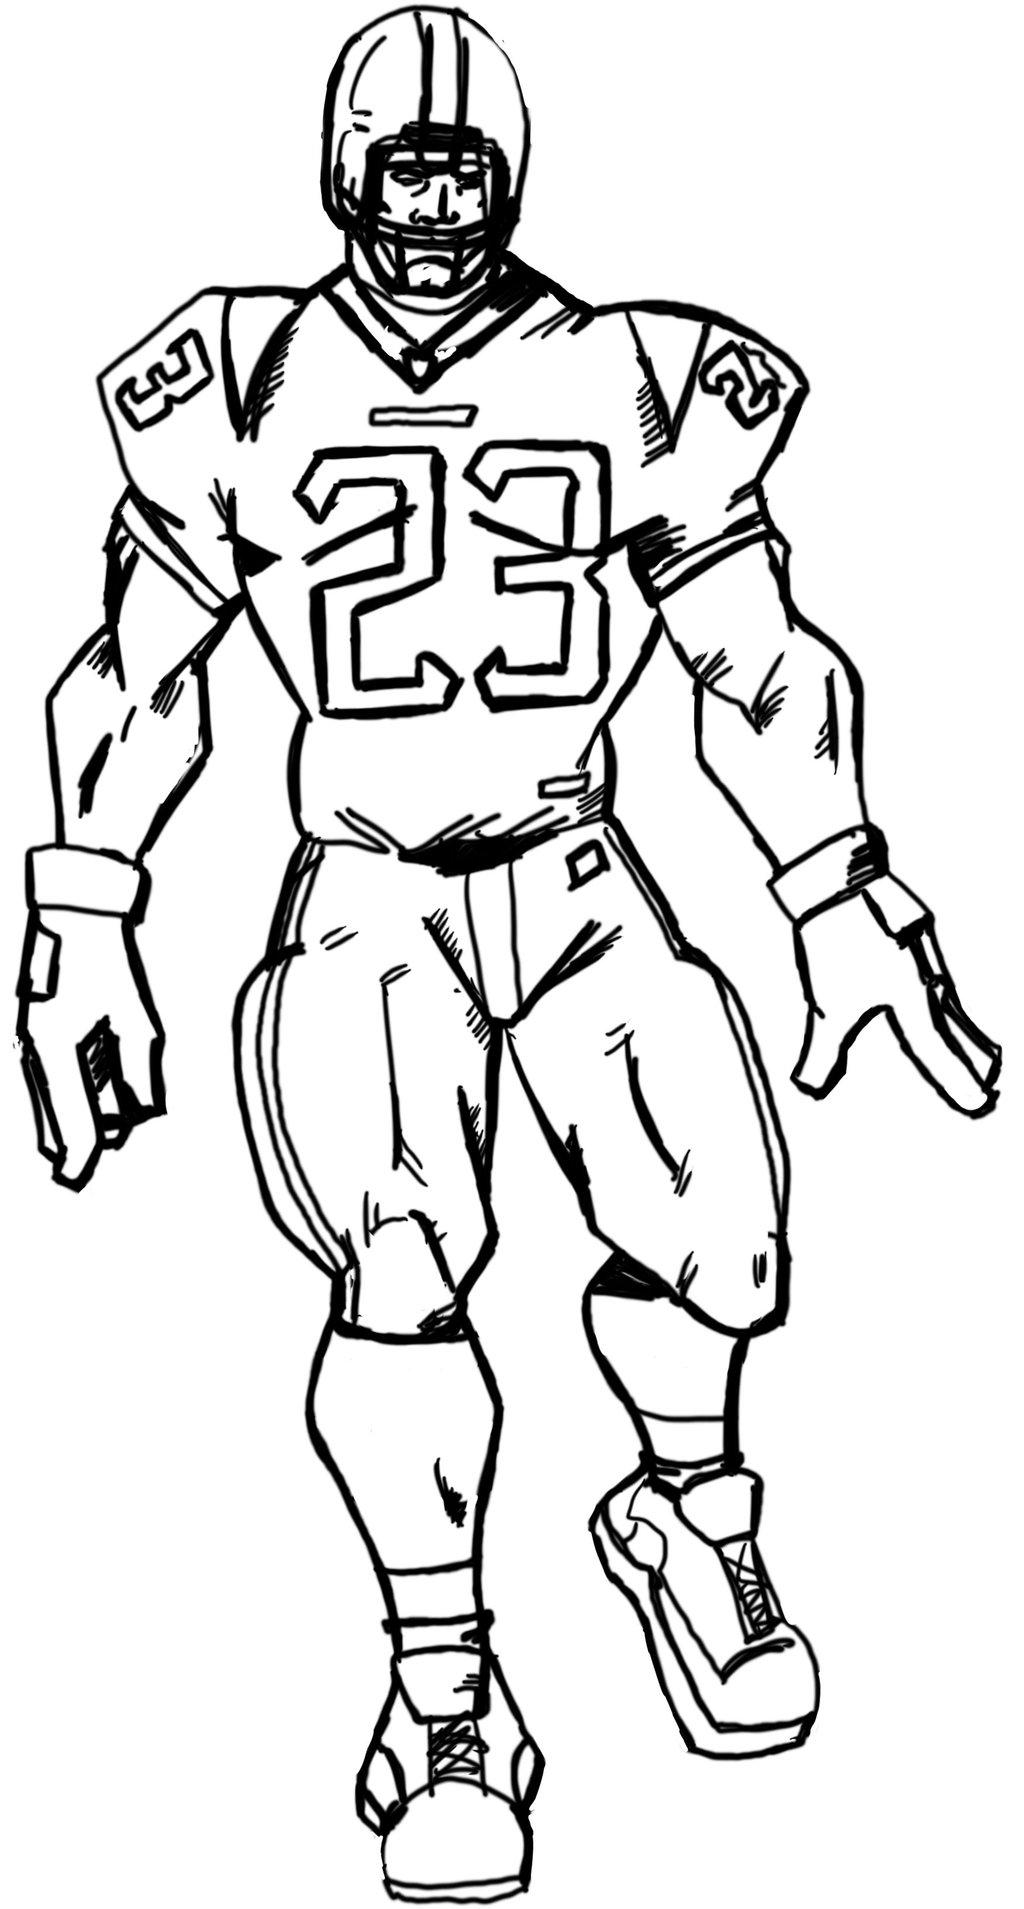 1024x1909 Drawing Of Football Players Avon Football Player 12royboyct